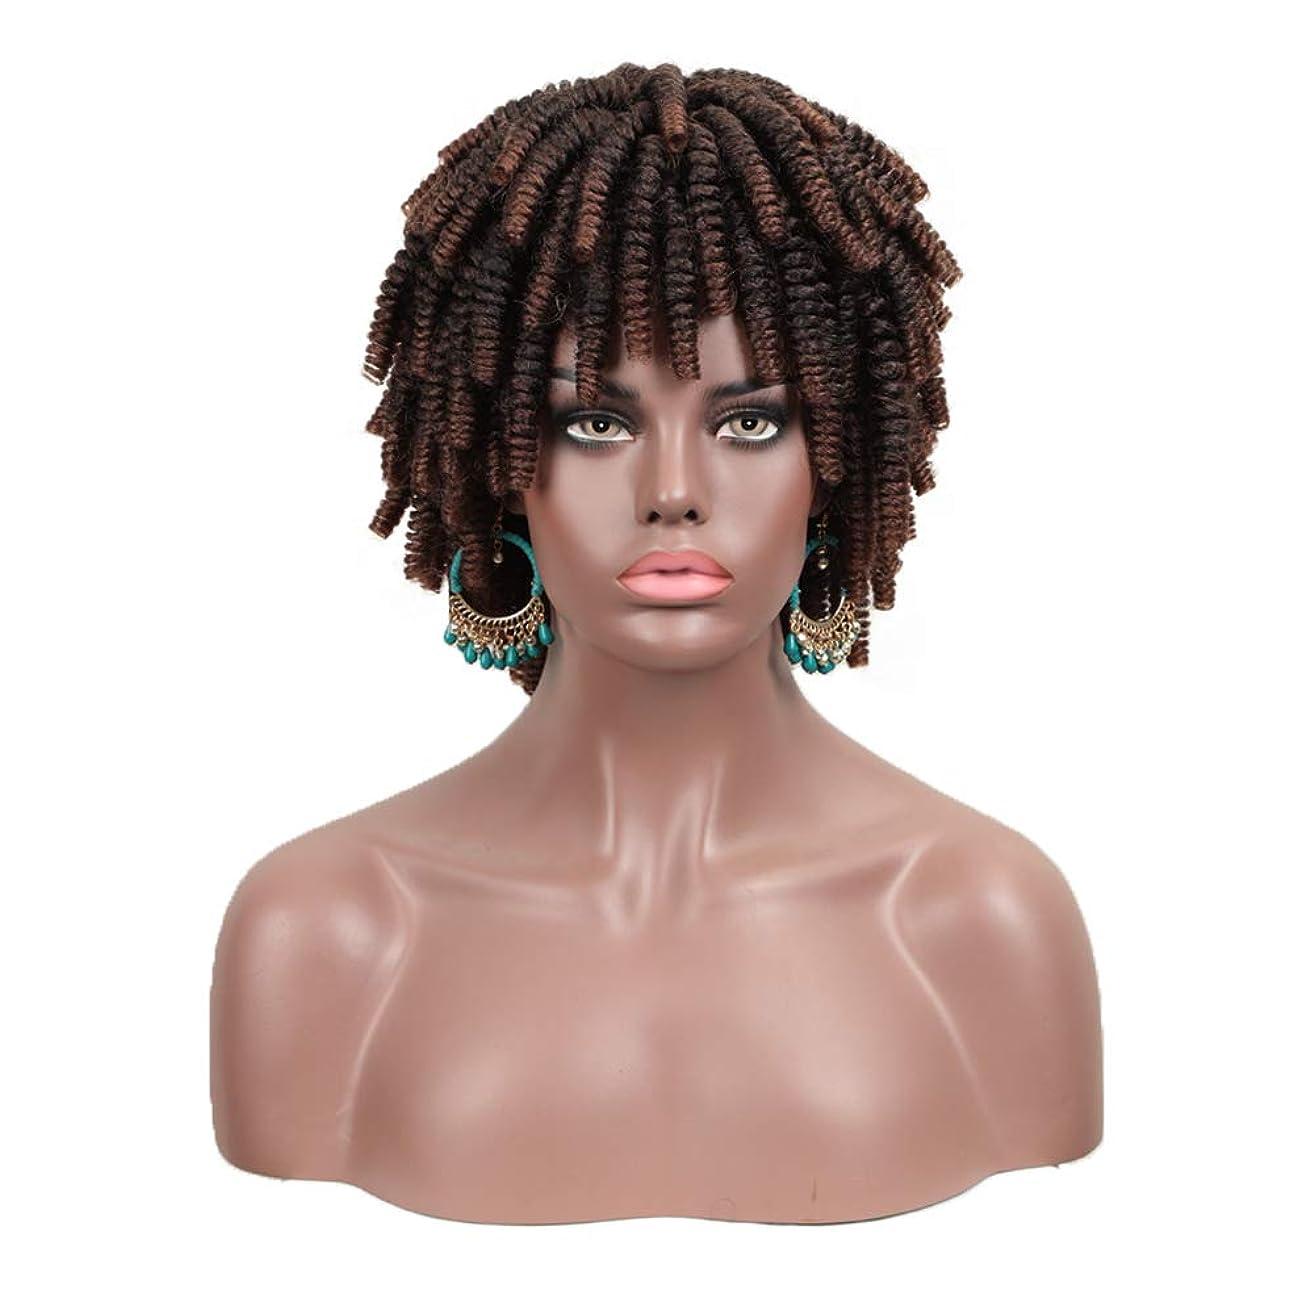 FASHION IDOL Spring Twist Braids Wig Curly Jamaican Bounce Jumpy African Bomb Twist Braids Wig Sythetic Short Ombre Color Wig For Black Women (T1B/30)